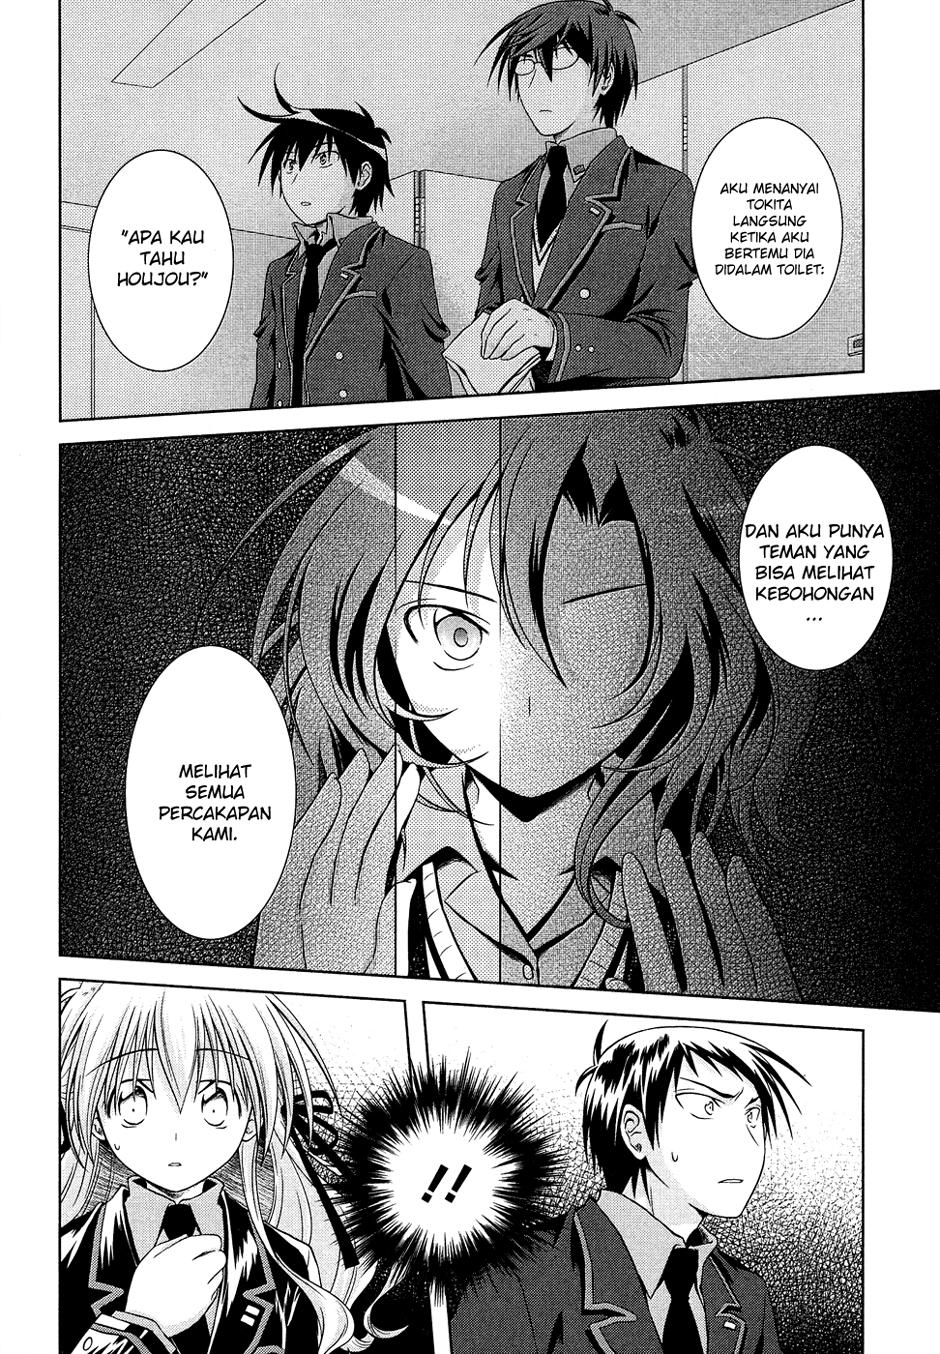 Komik iris zero 011 12 Indonesia iris zero 011 Terbaru 25 Baca Manga Komik Indonesia 